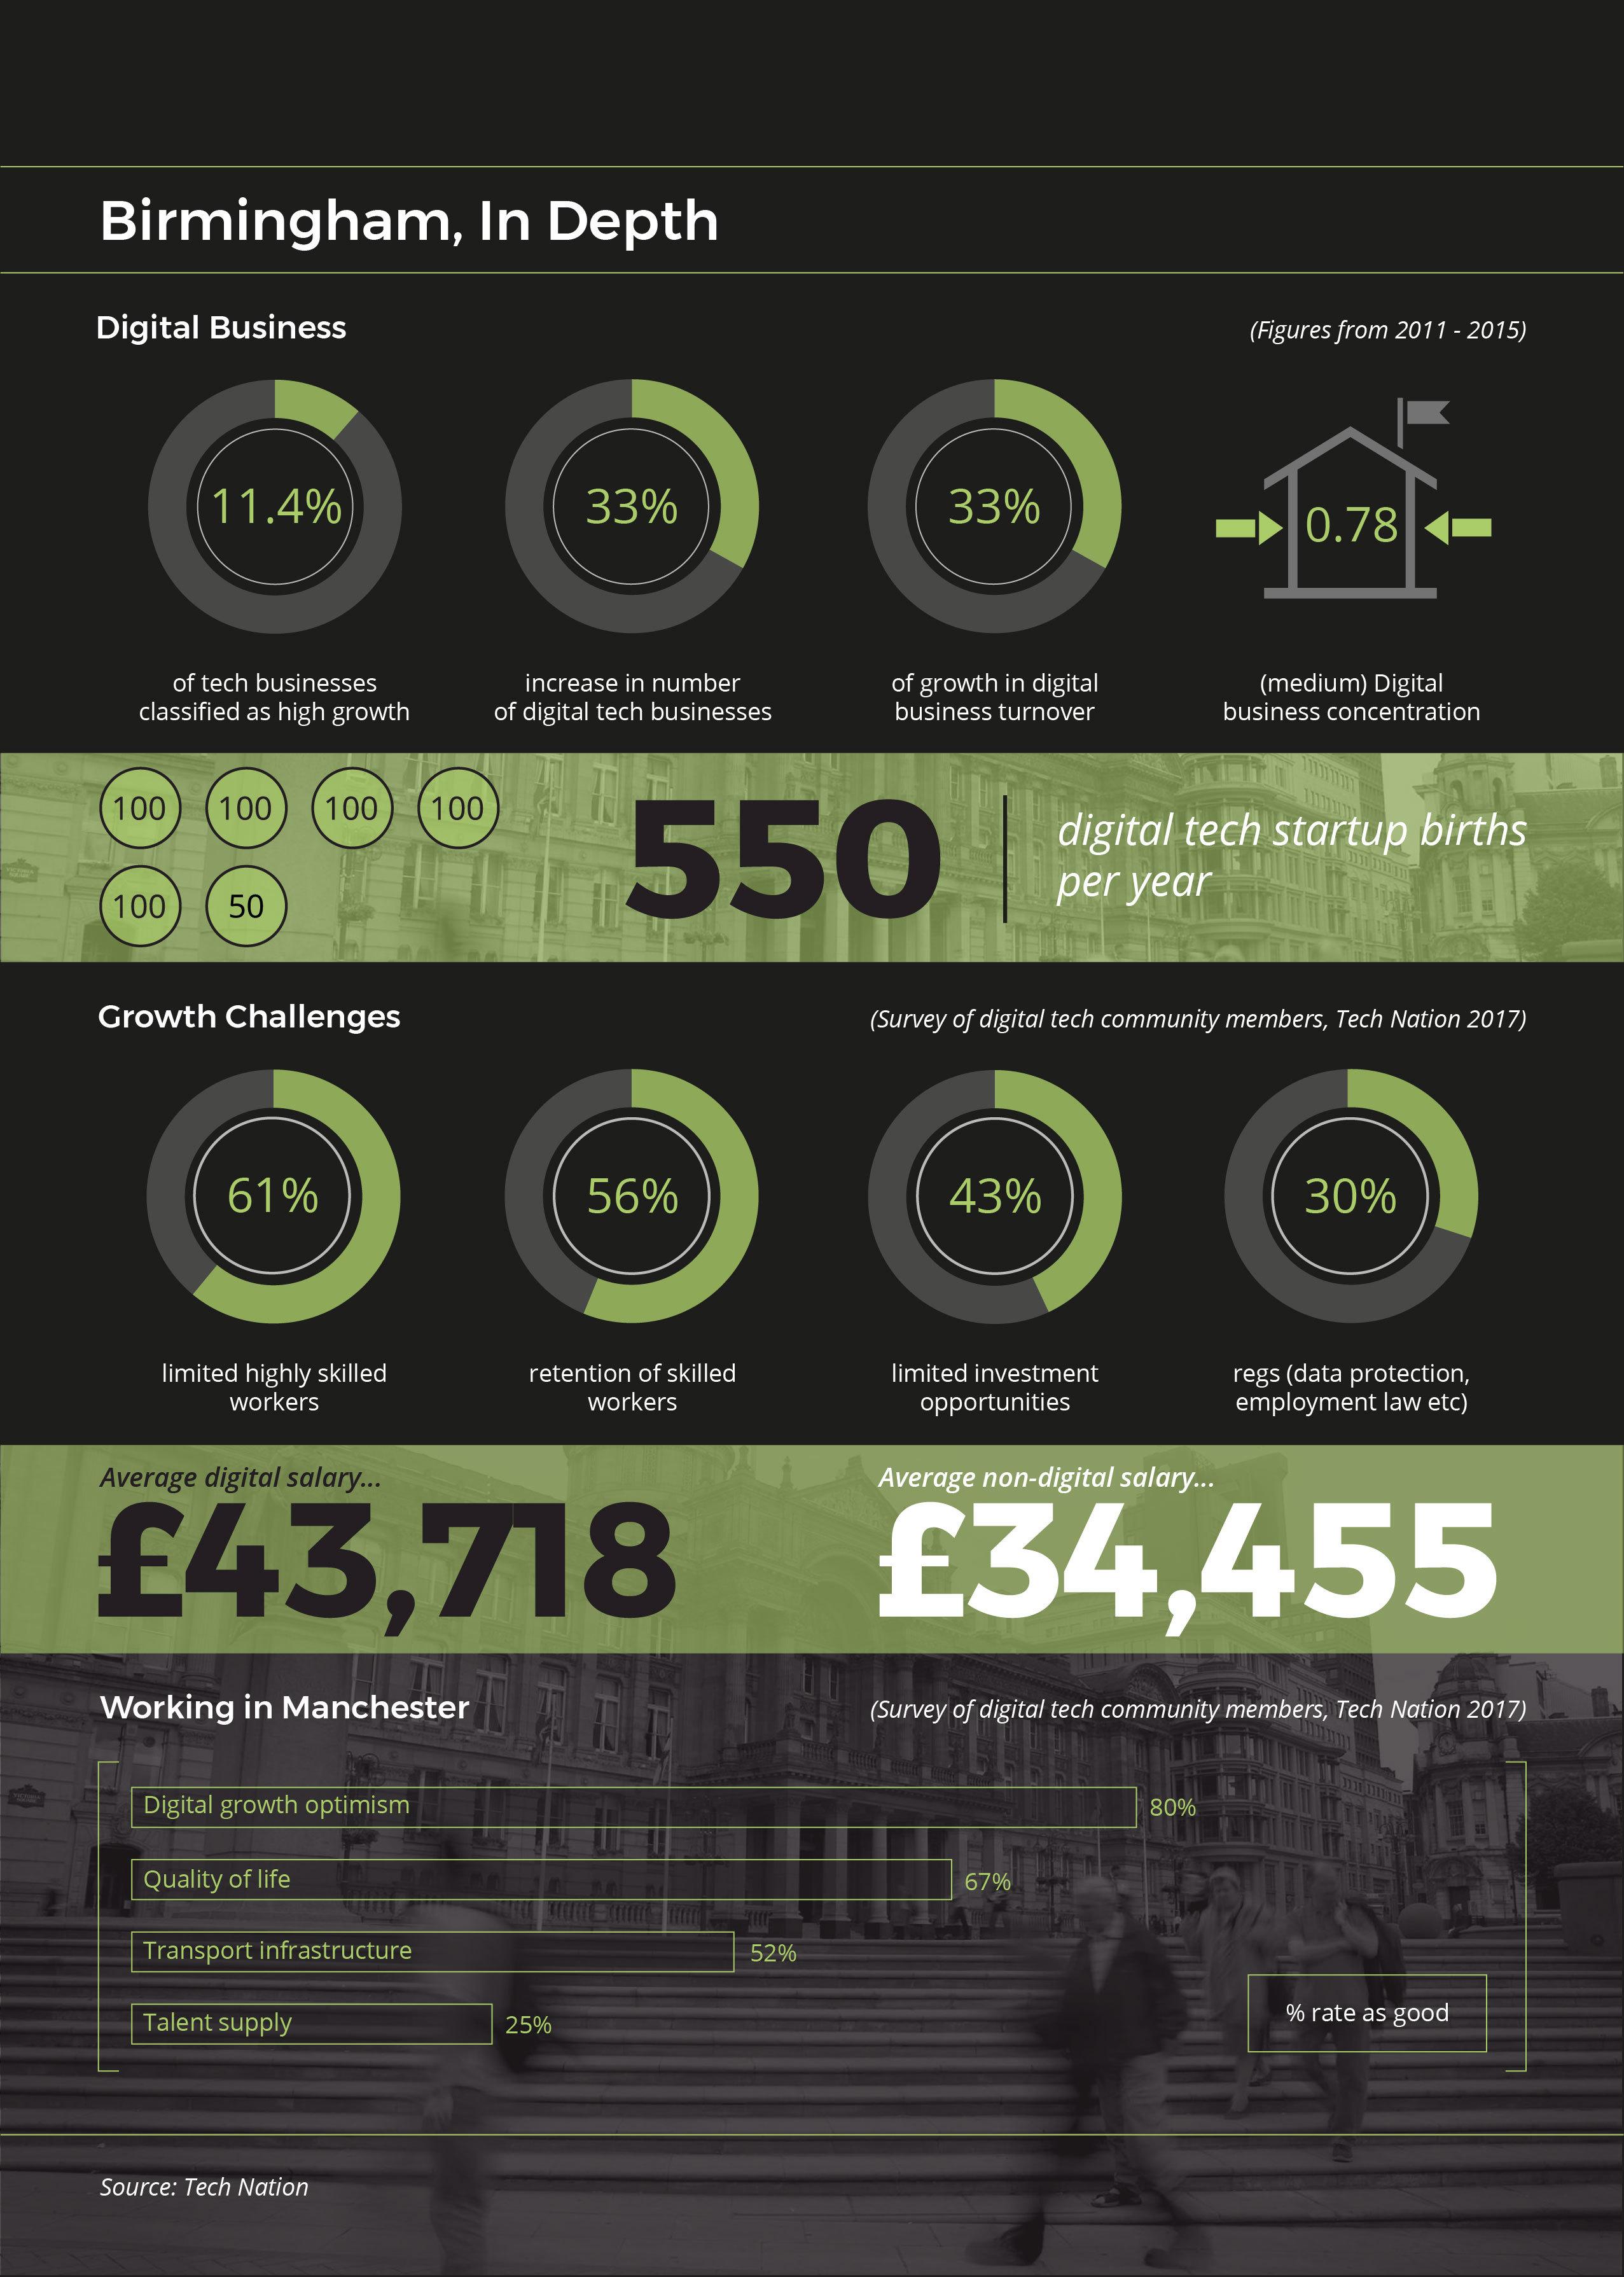 Birmingham Digital Economy - In Depth